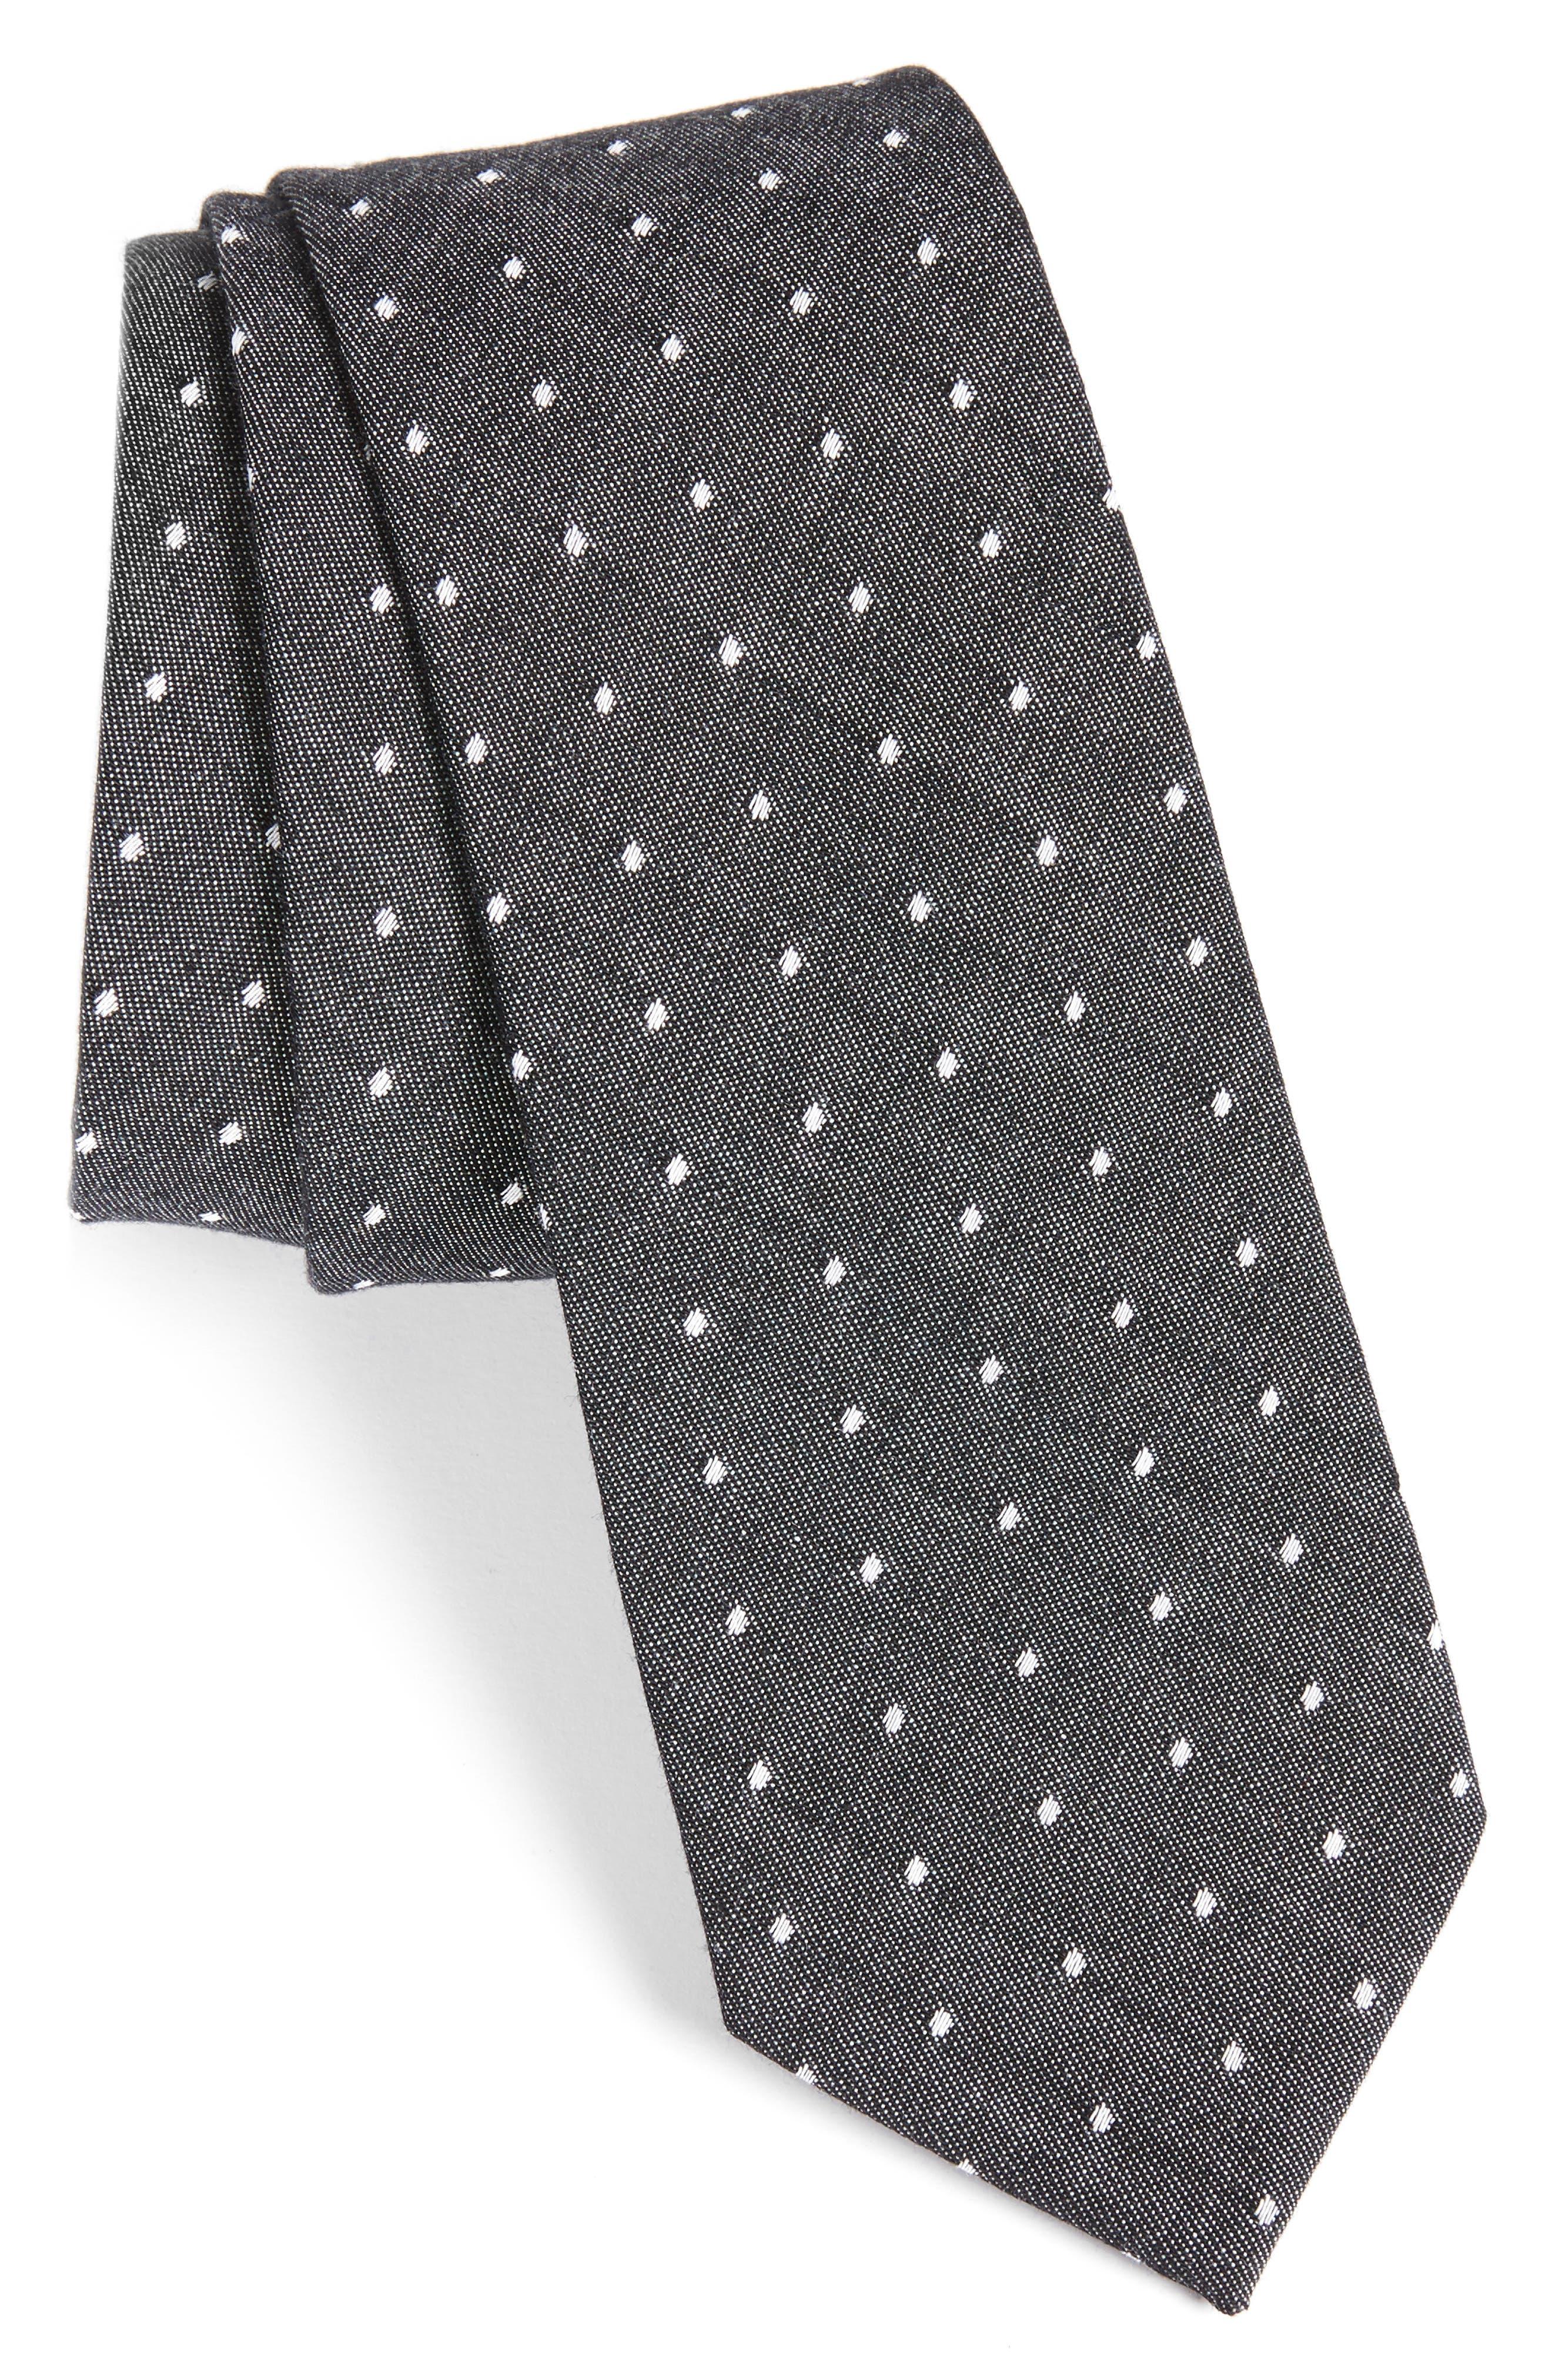 Alternate Image 1 Selected - 1901 Dot Cotton Tie